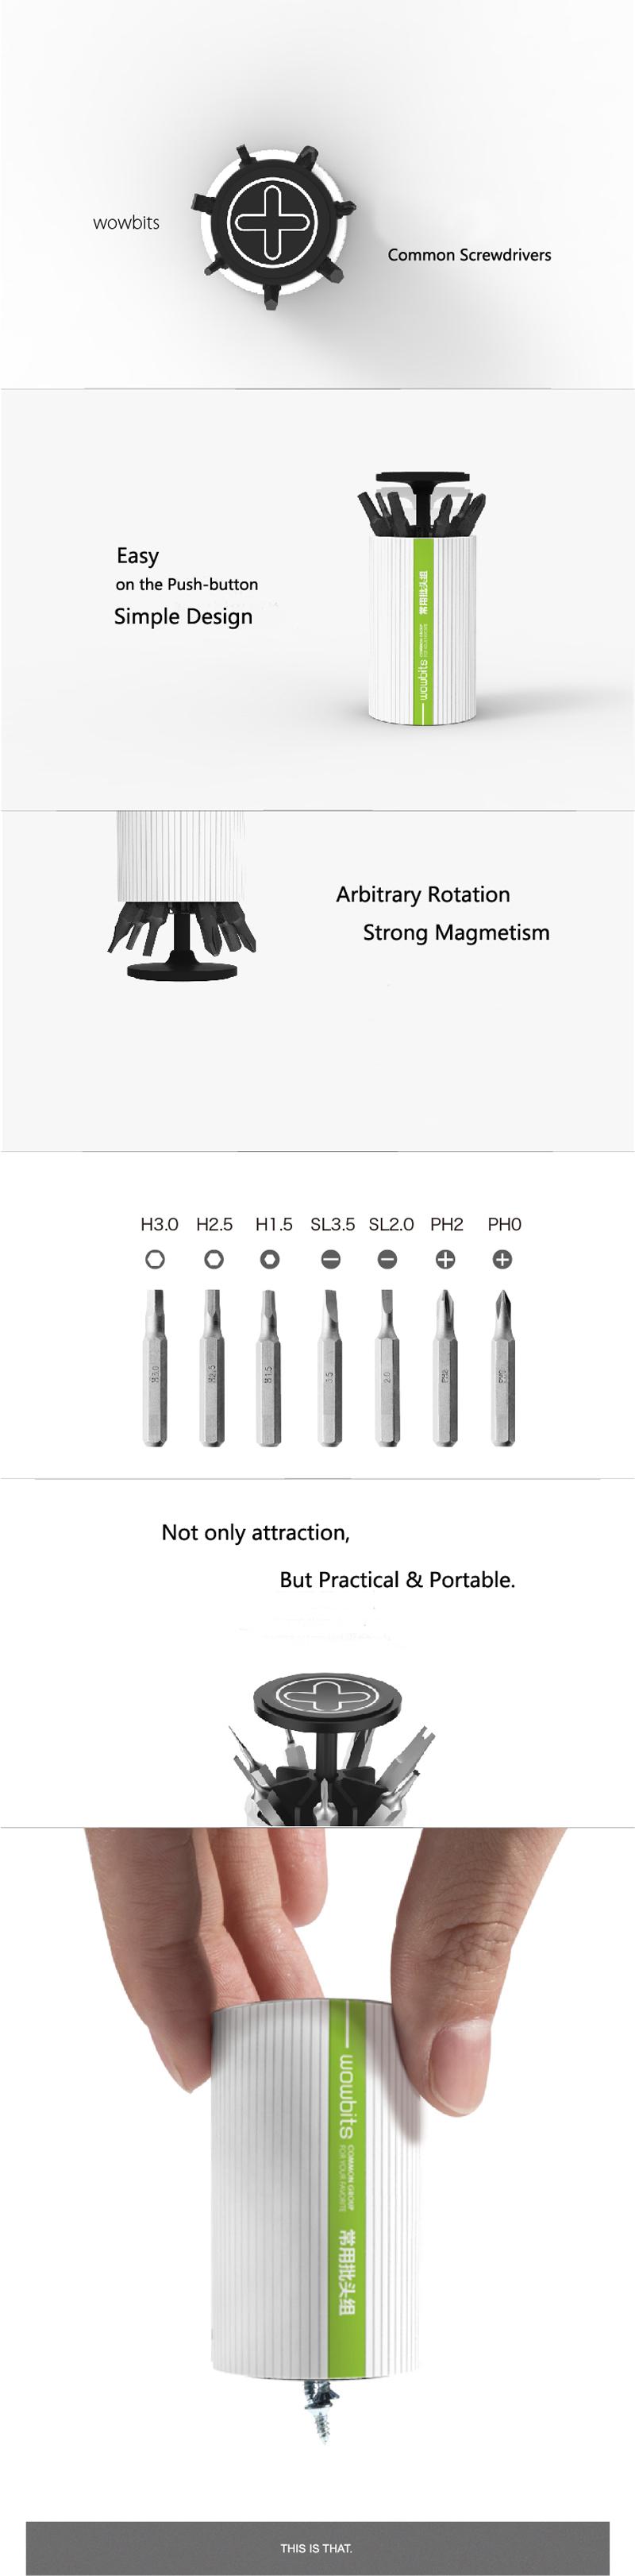 21Pcs Wowbits Professional 4mm Hex Electric Screwdrivers S2 Alloy Steel Magnetic Screw Bits Set